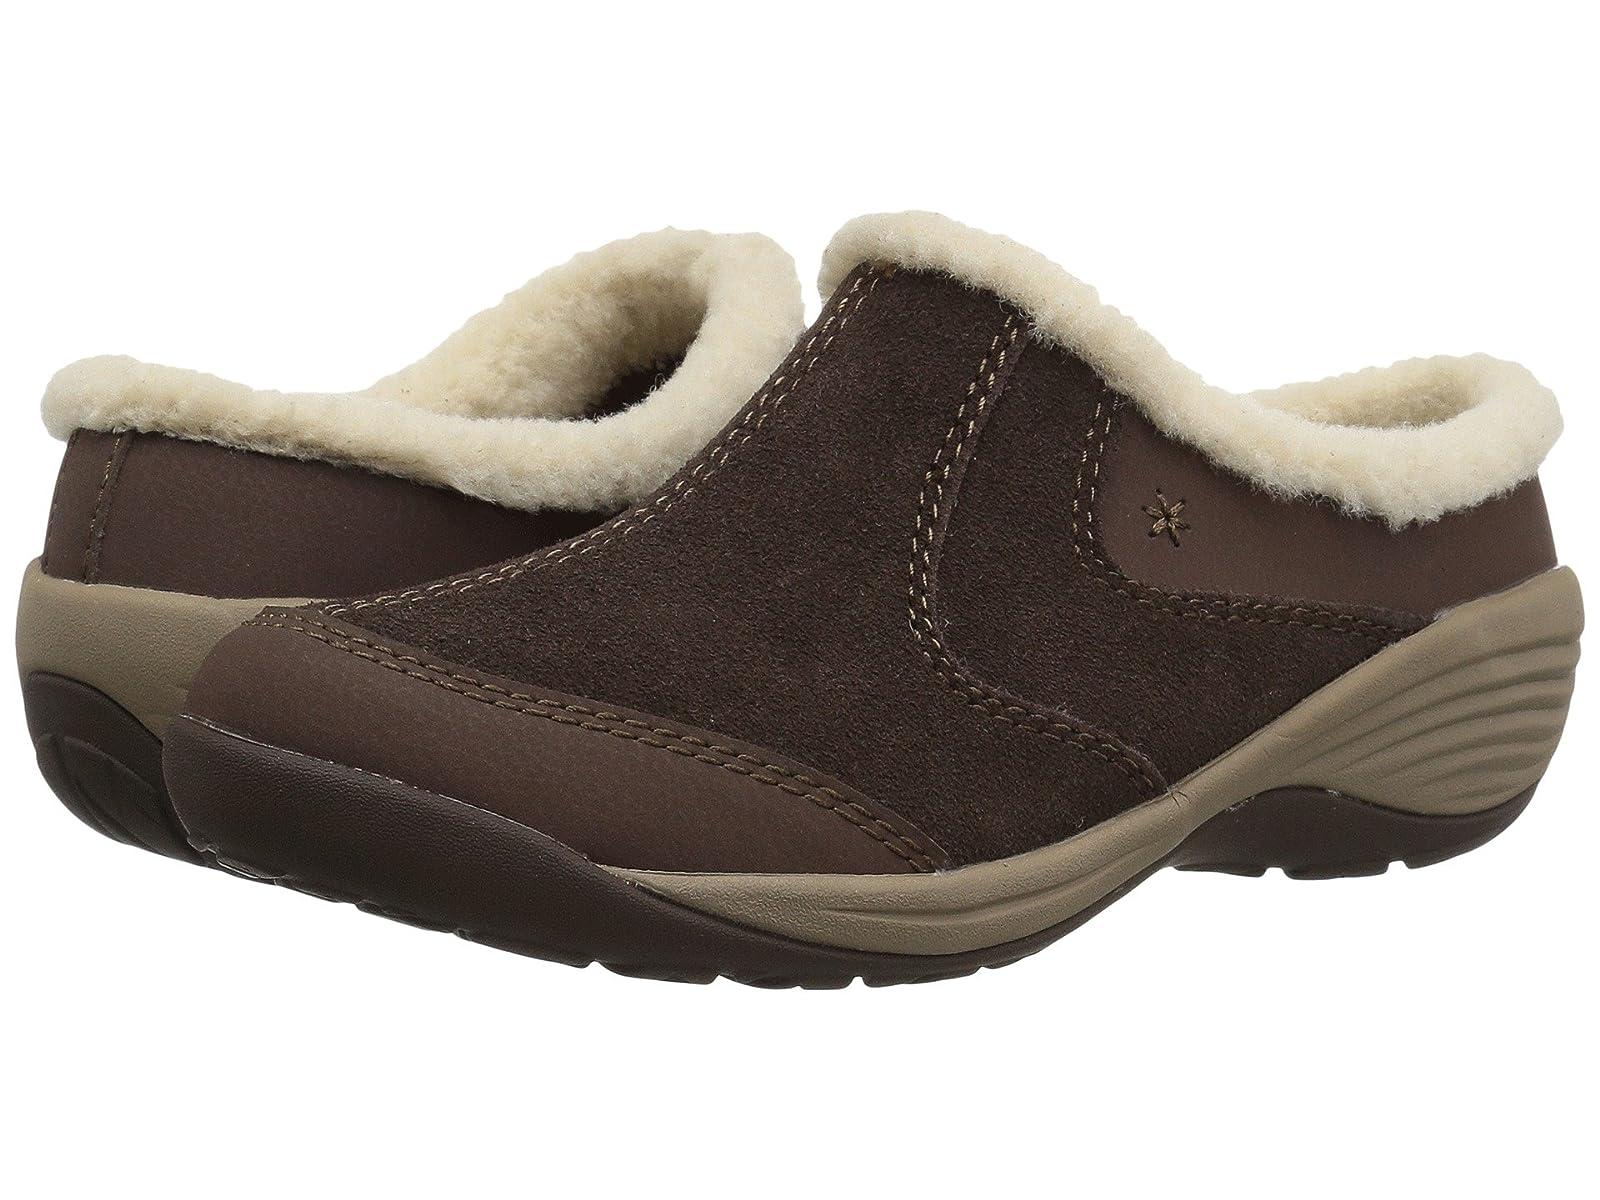 Easy Spirit InglefurCheap and distinctive eye-catching shoes